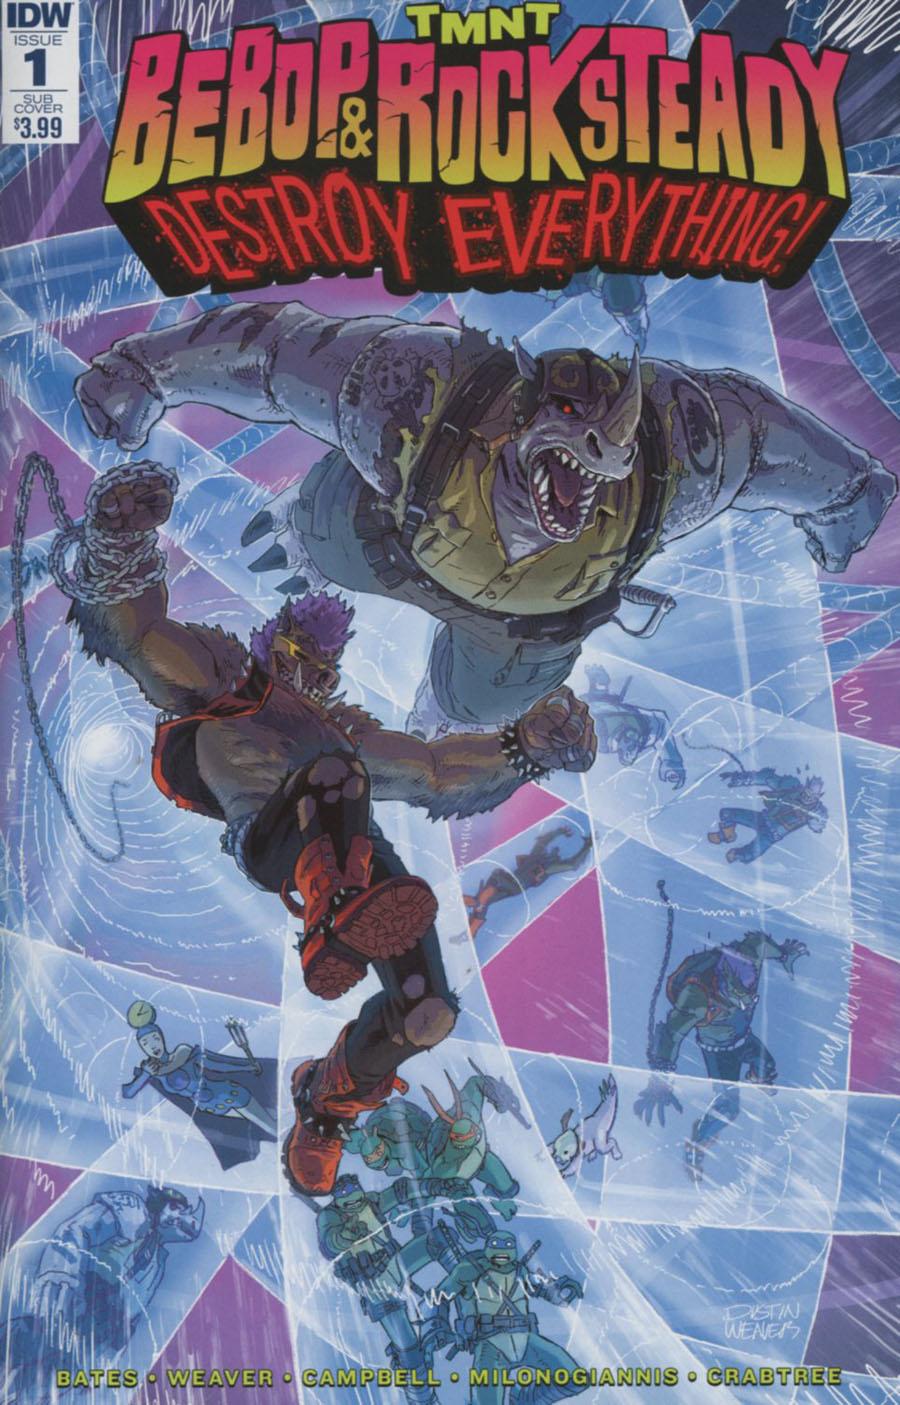 Teenage Mutant Ninja Turtles Bebop & Rocksteady Destroy Everything #1 Cover B Variant Dustin Weaver Subscription Cover